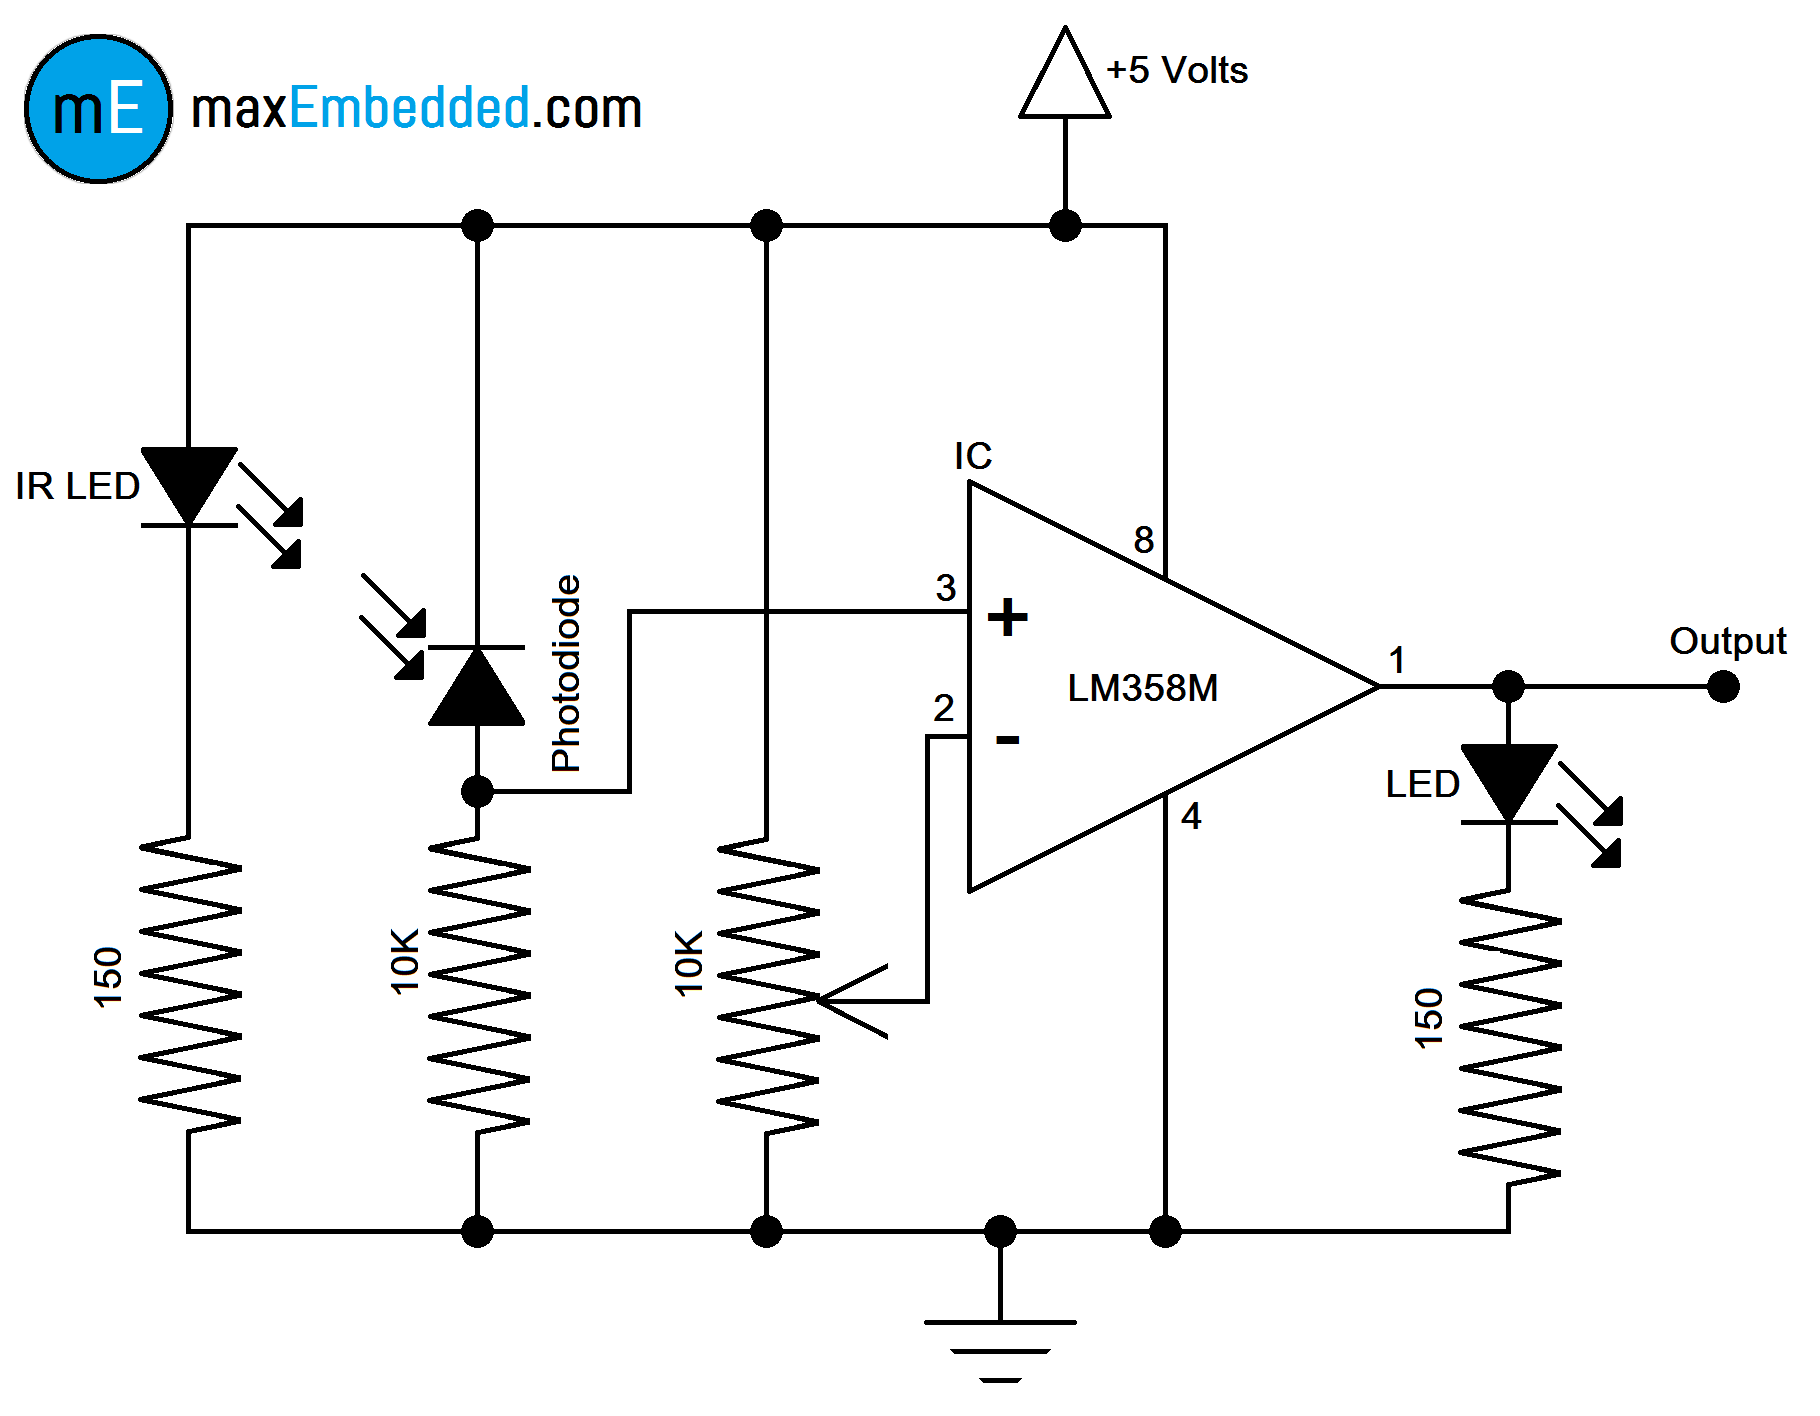 how to build an ir sensor maxembeddedInfraredsensormodulecircuitdiagram #6